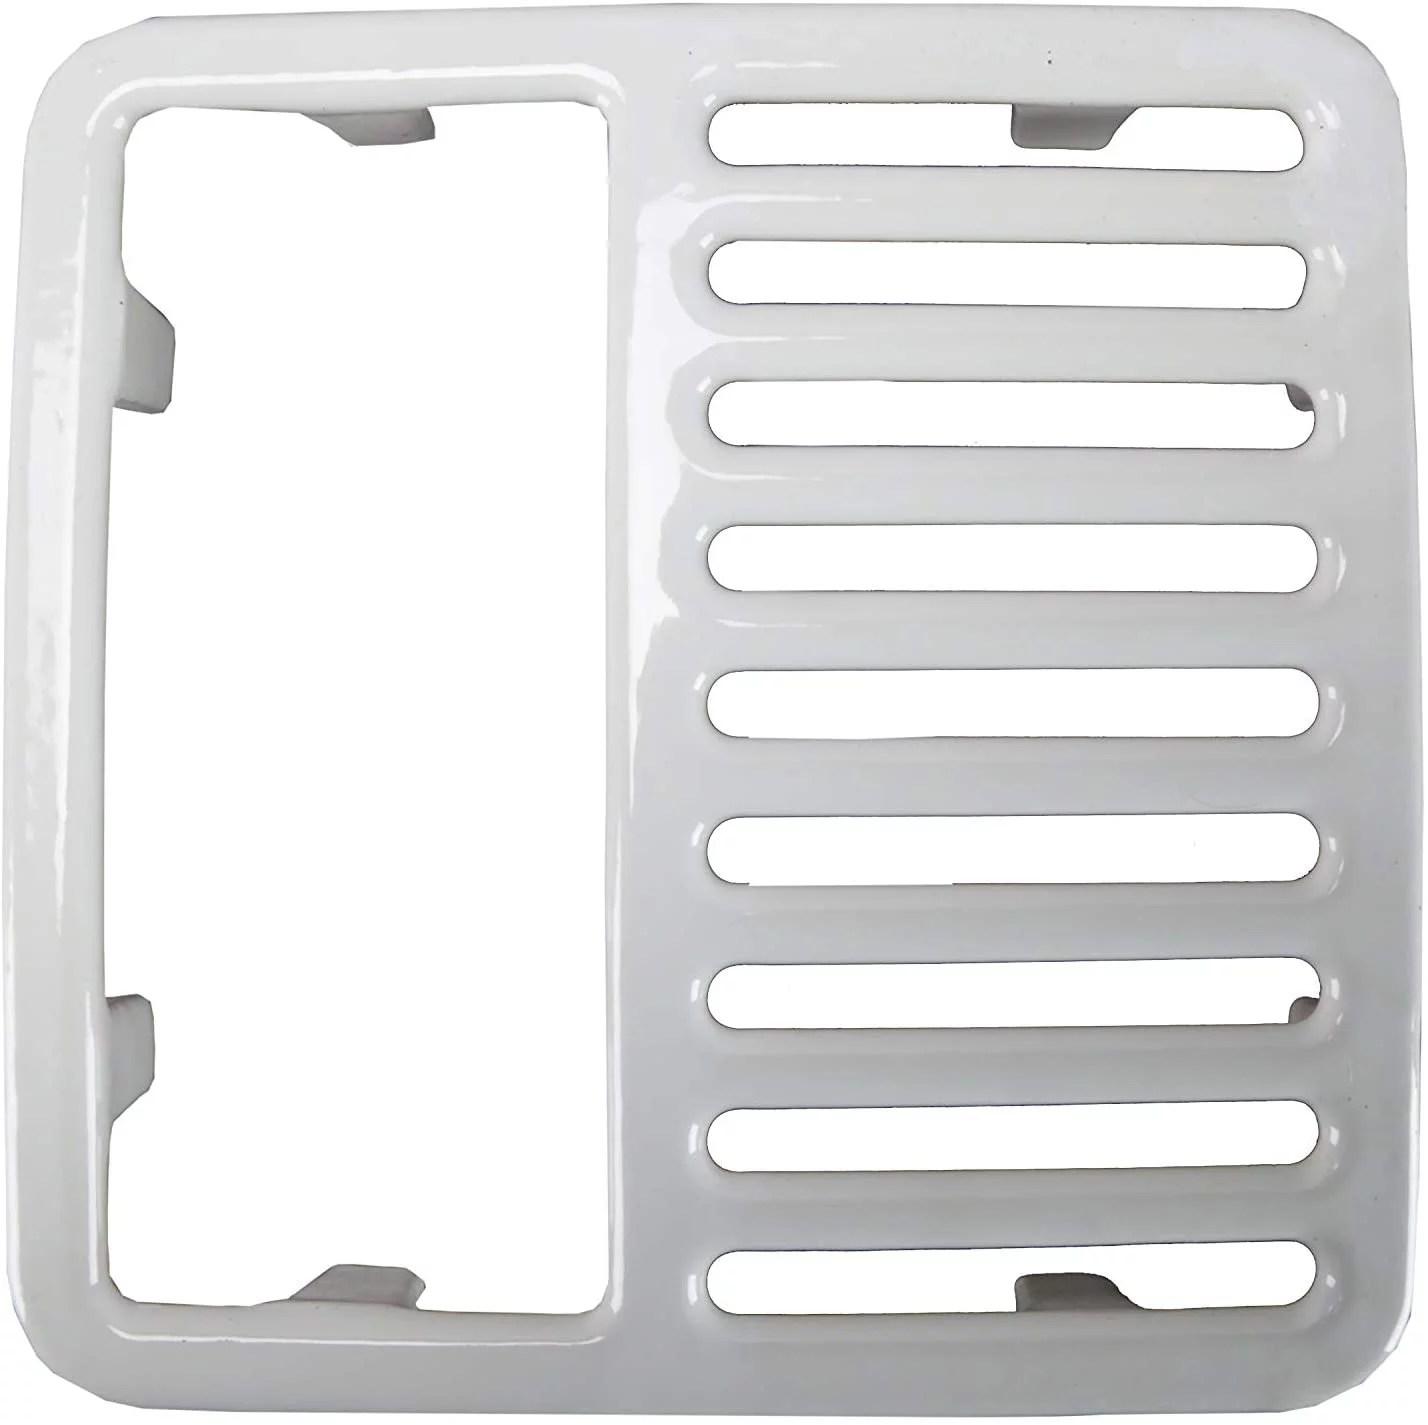 gsw fs t1 2 cast iron floor sink top grate with ceramic surface 1 2 size 9 3 8 w x 9 3 8 l walmart com